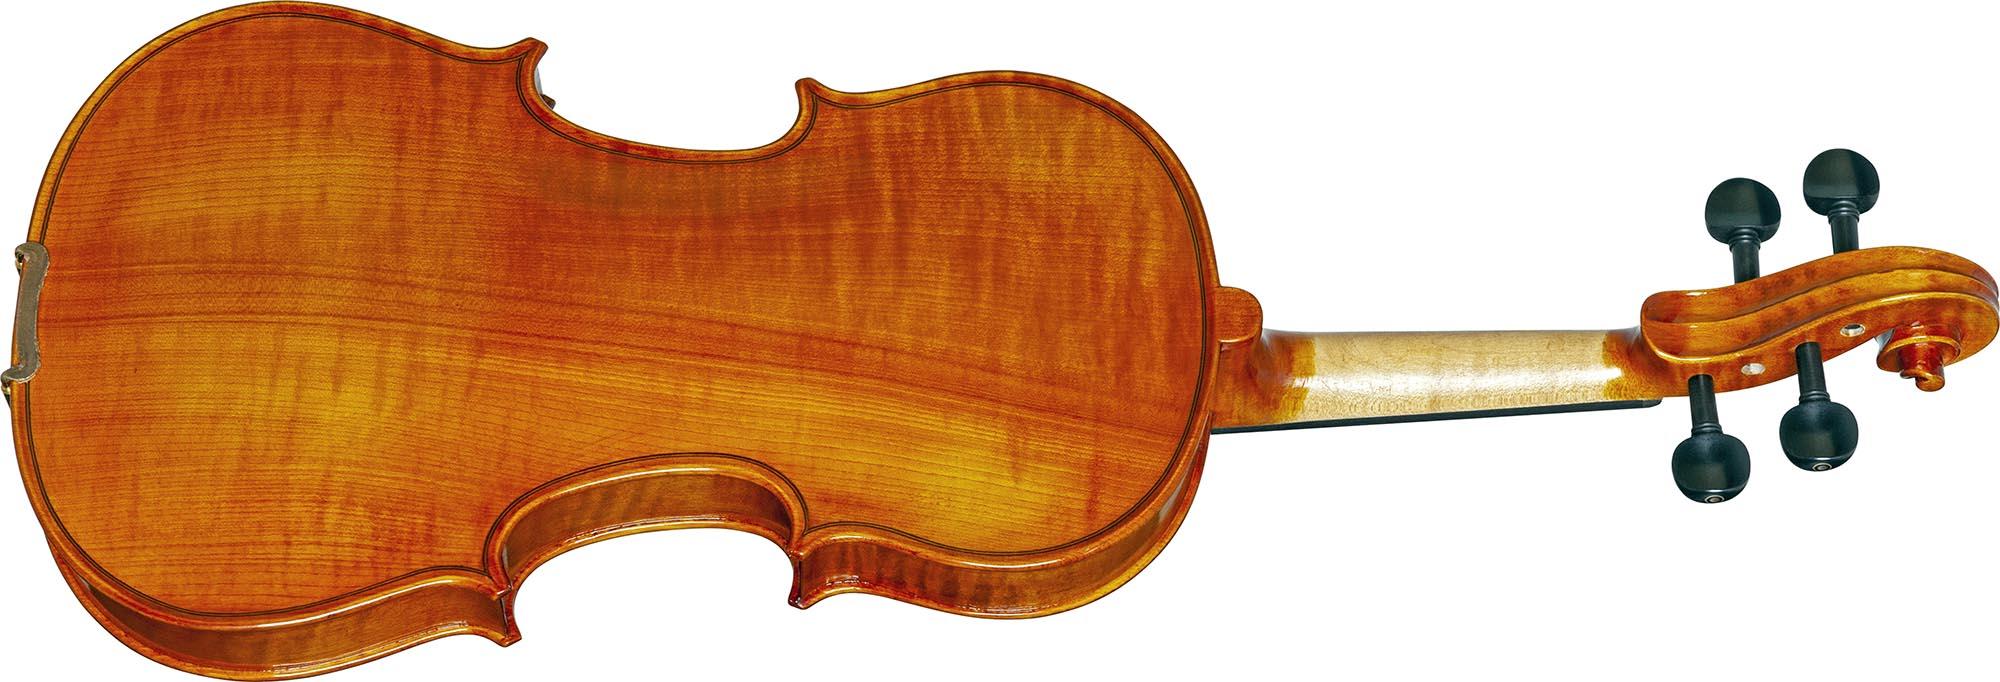 vk844 violino eagle vk844 visao posterior